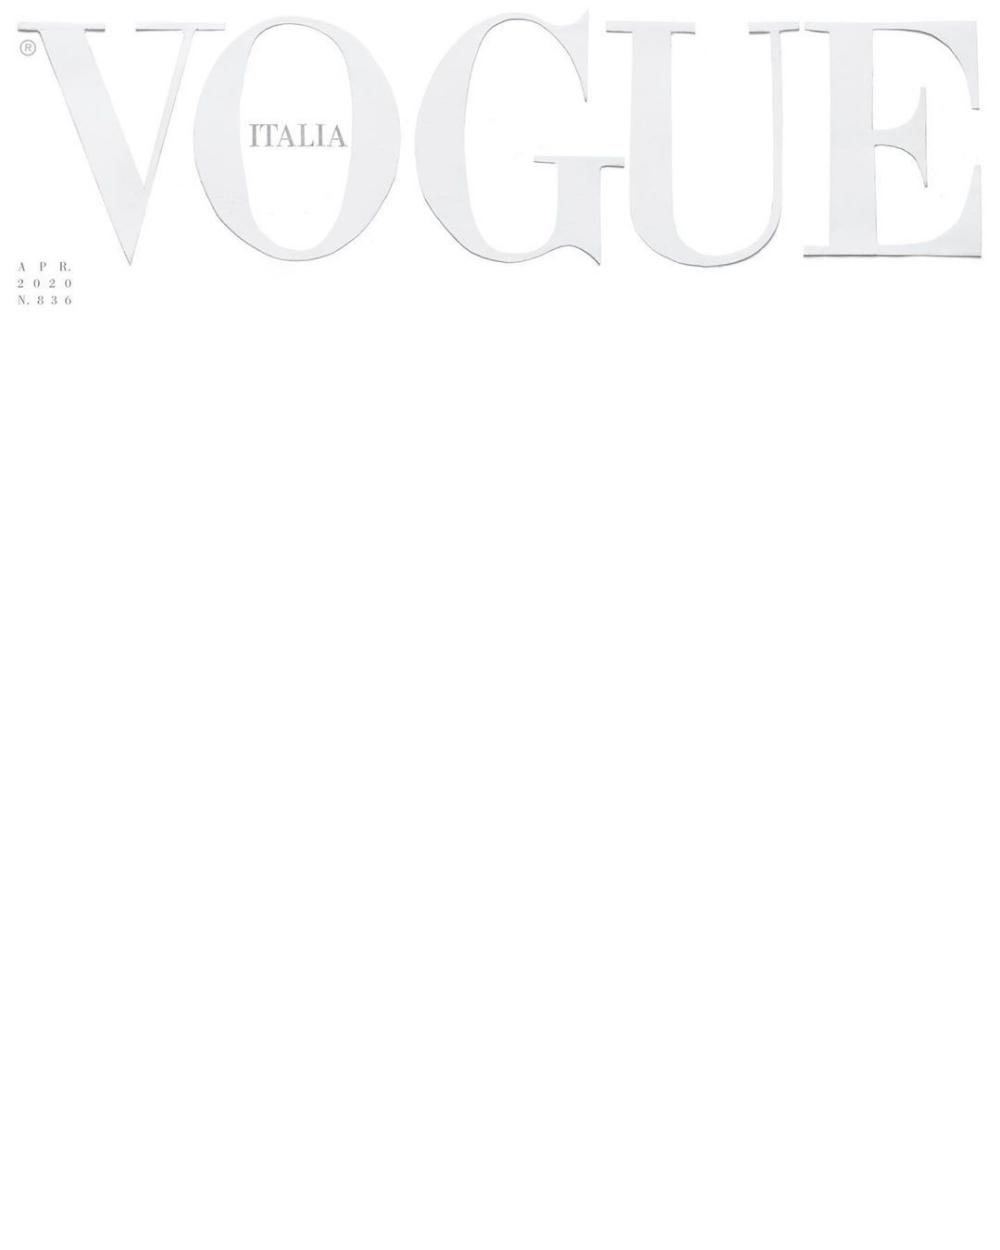 Vogue Italia Printed A Blank White Cover Vogue Italia Vogue Covers Magazine Cover Template